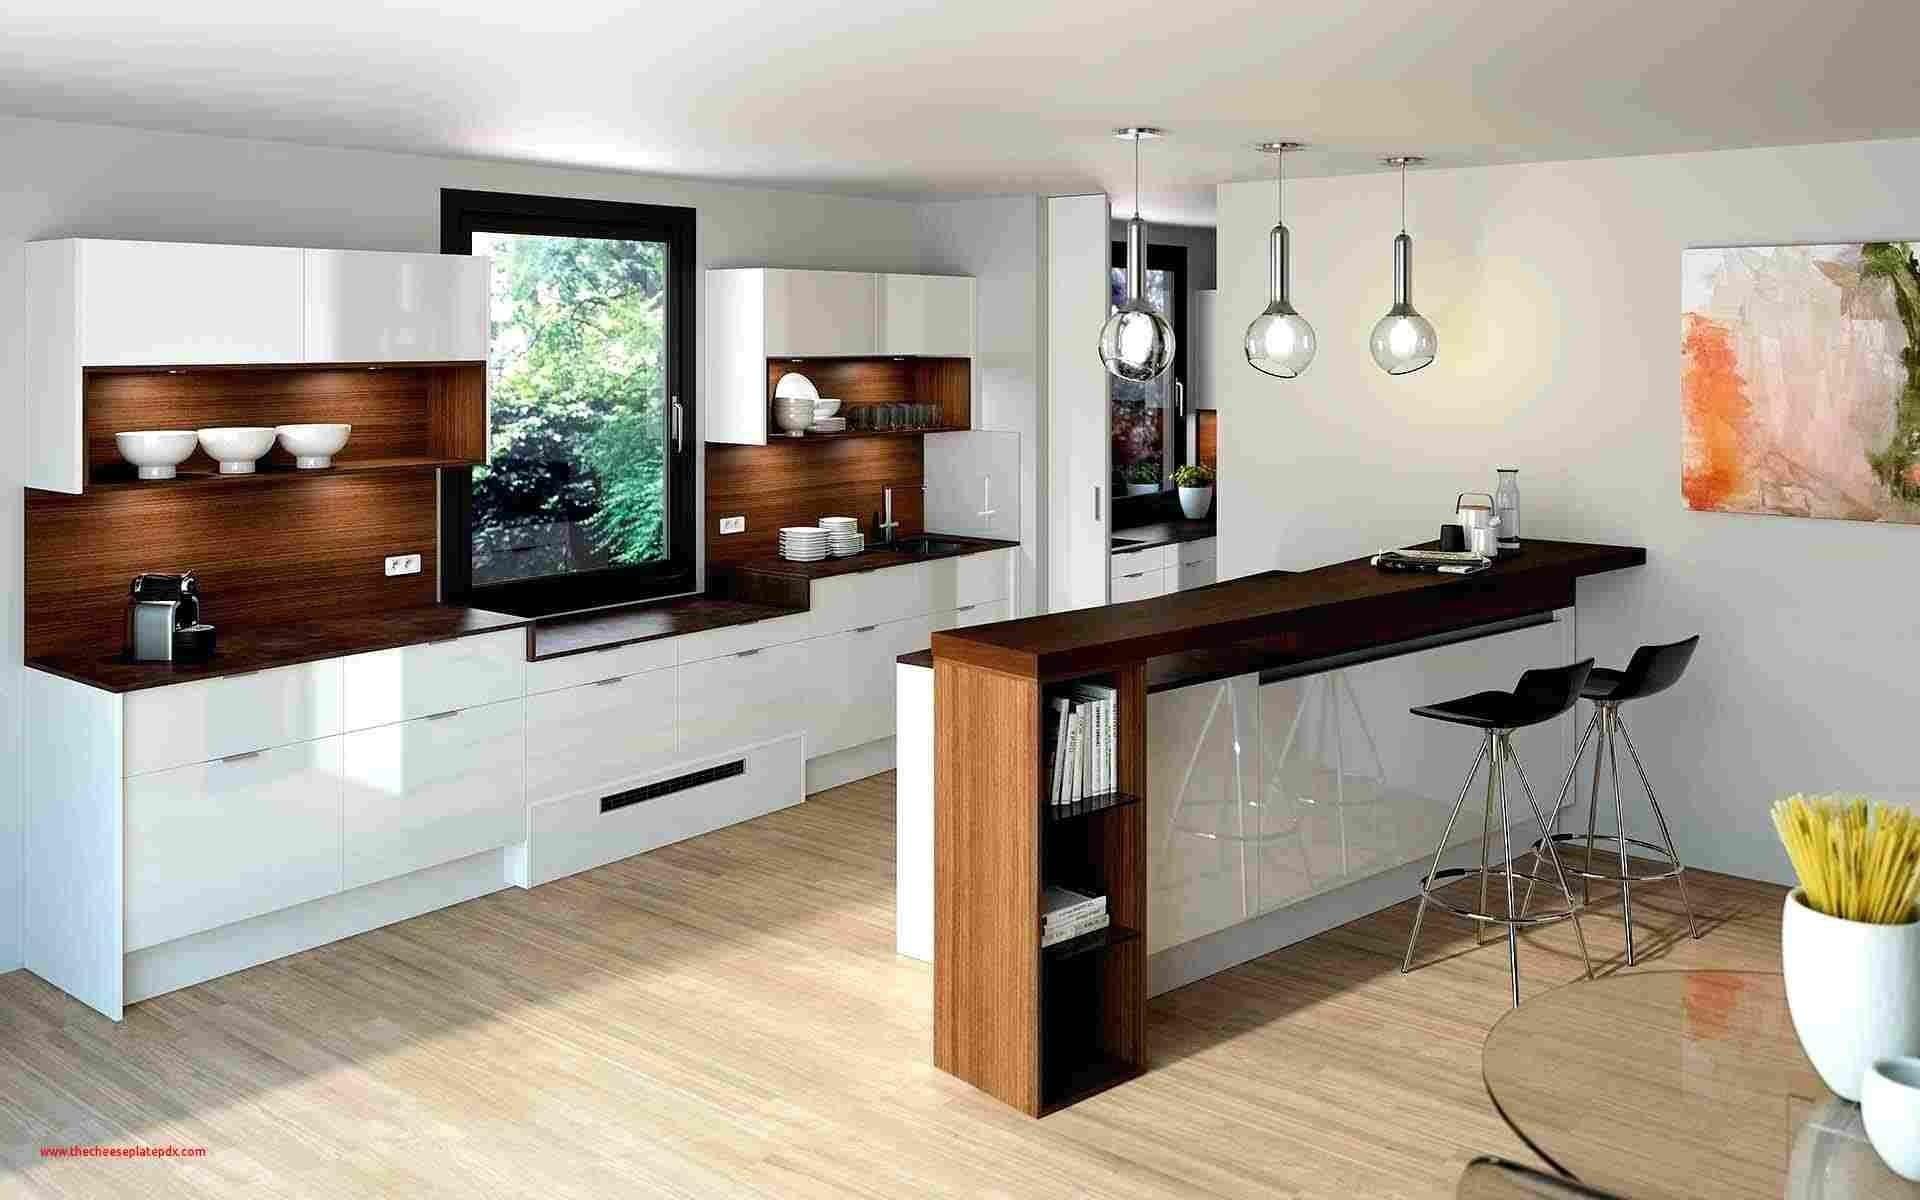 32 Neu Ikea Kuche Montage Erfahrung Kitchen Pinterest Kitchen